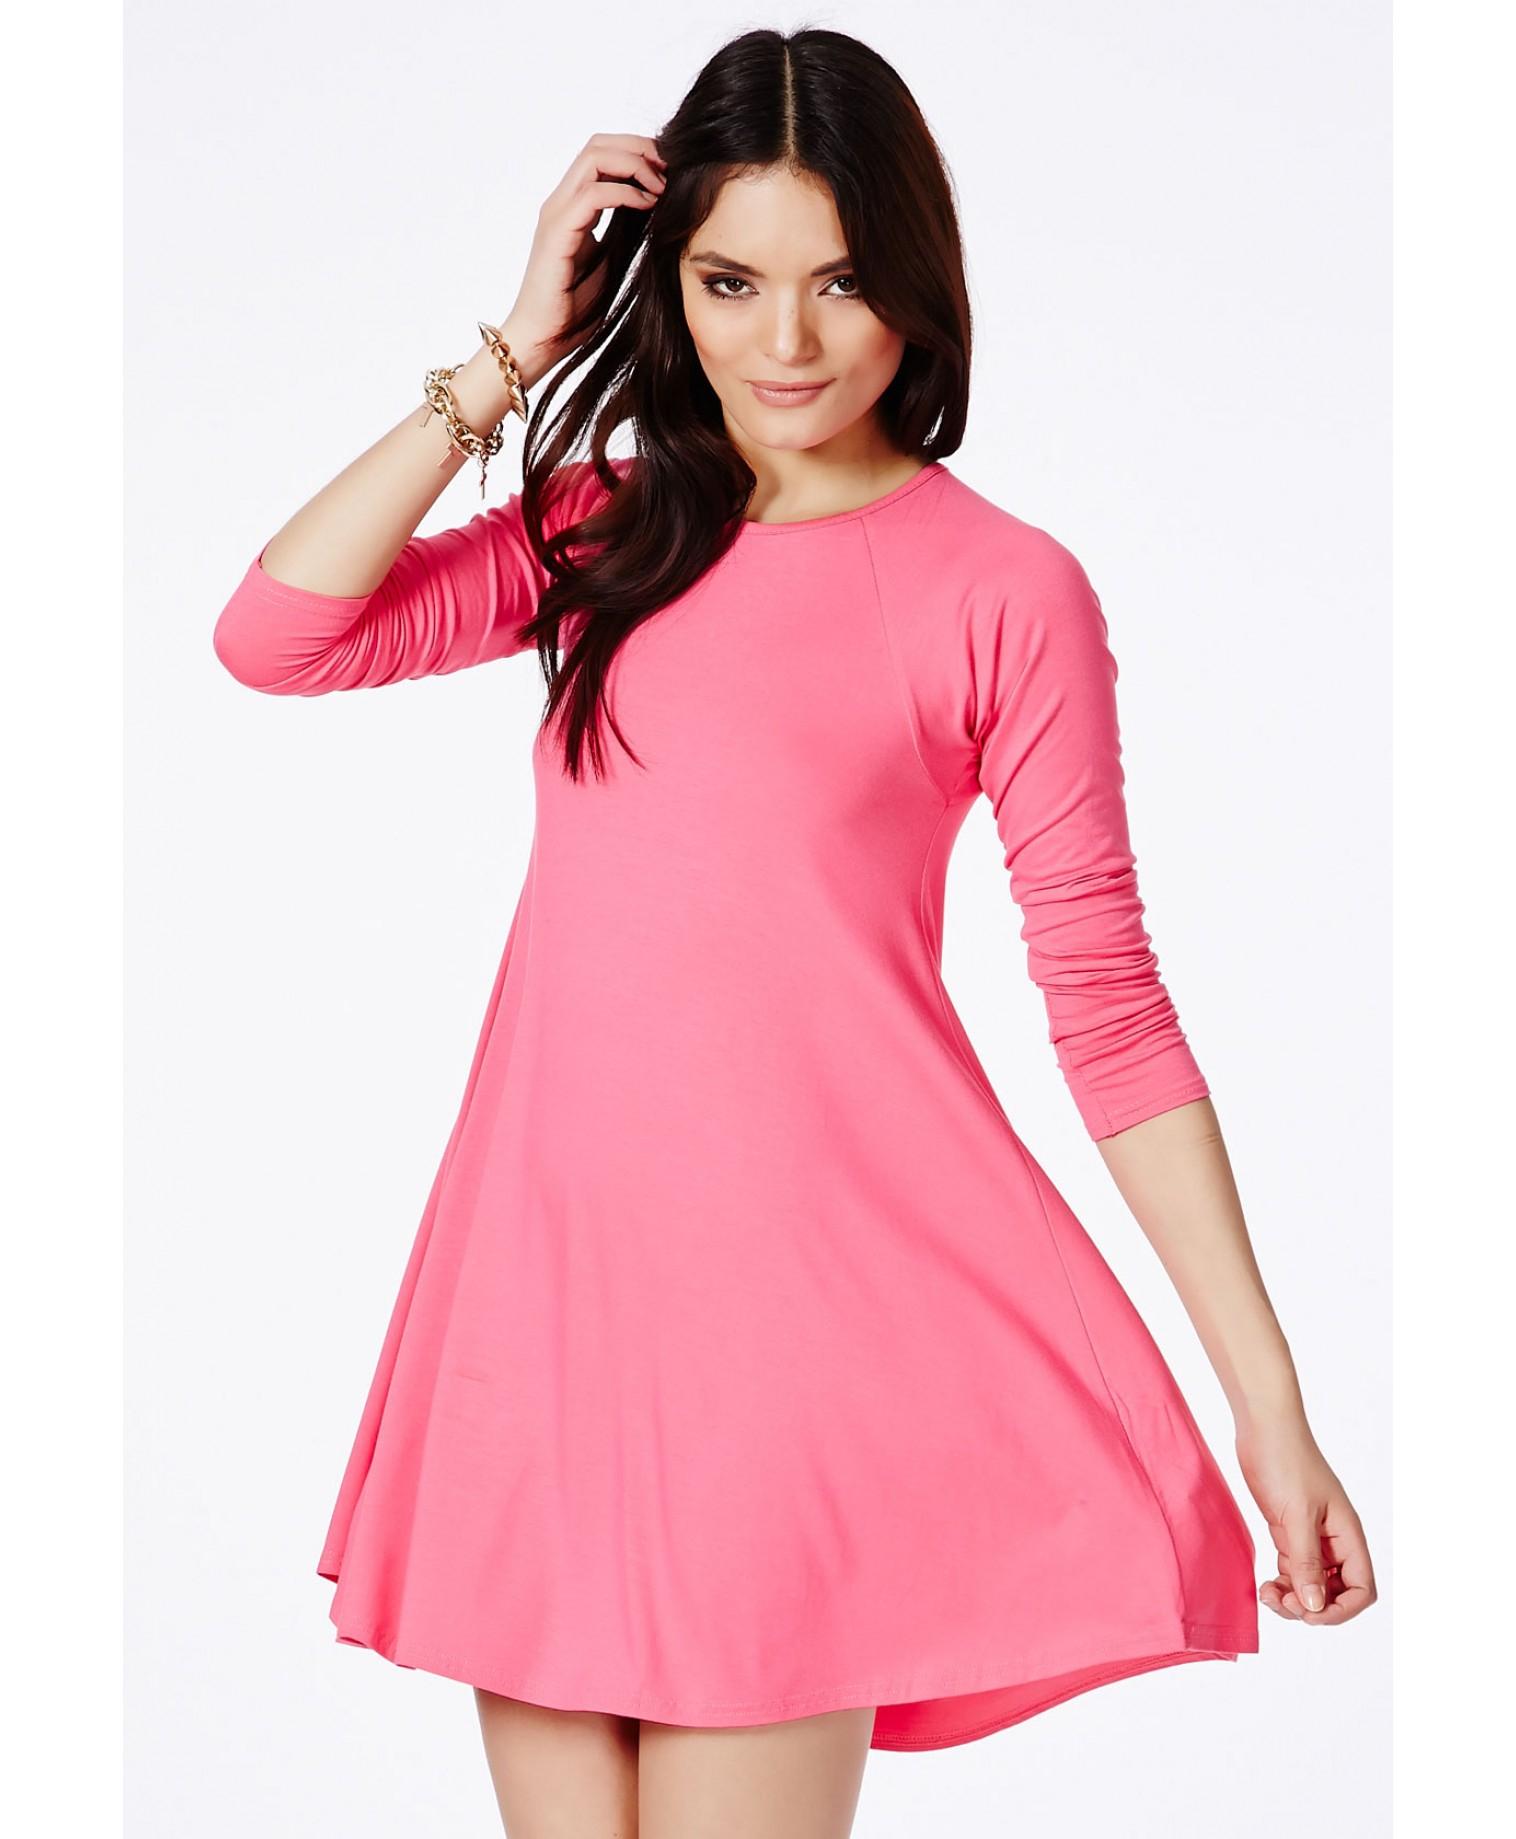 Mikita long sleeve swing dress in blush